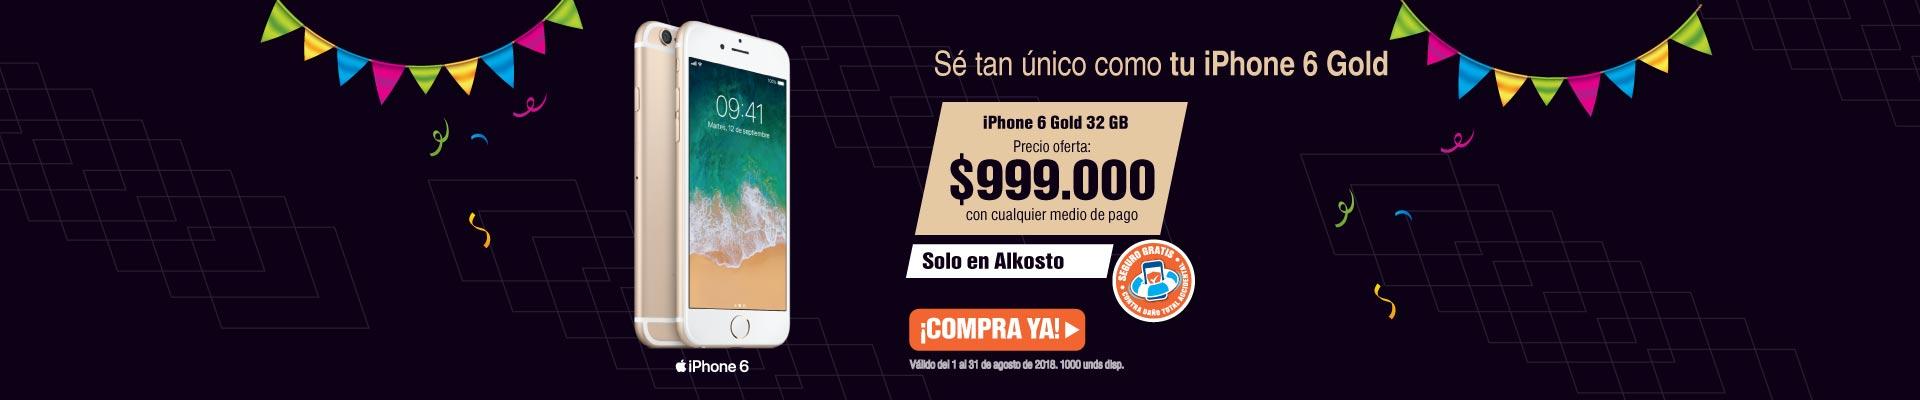 AK-PPAL-3-celulares-PP-EXPM-Apple-iPhone6Dr-Ago16